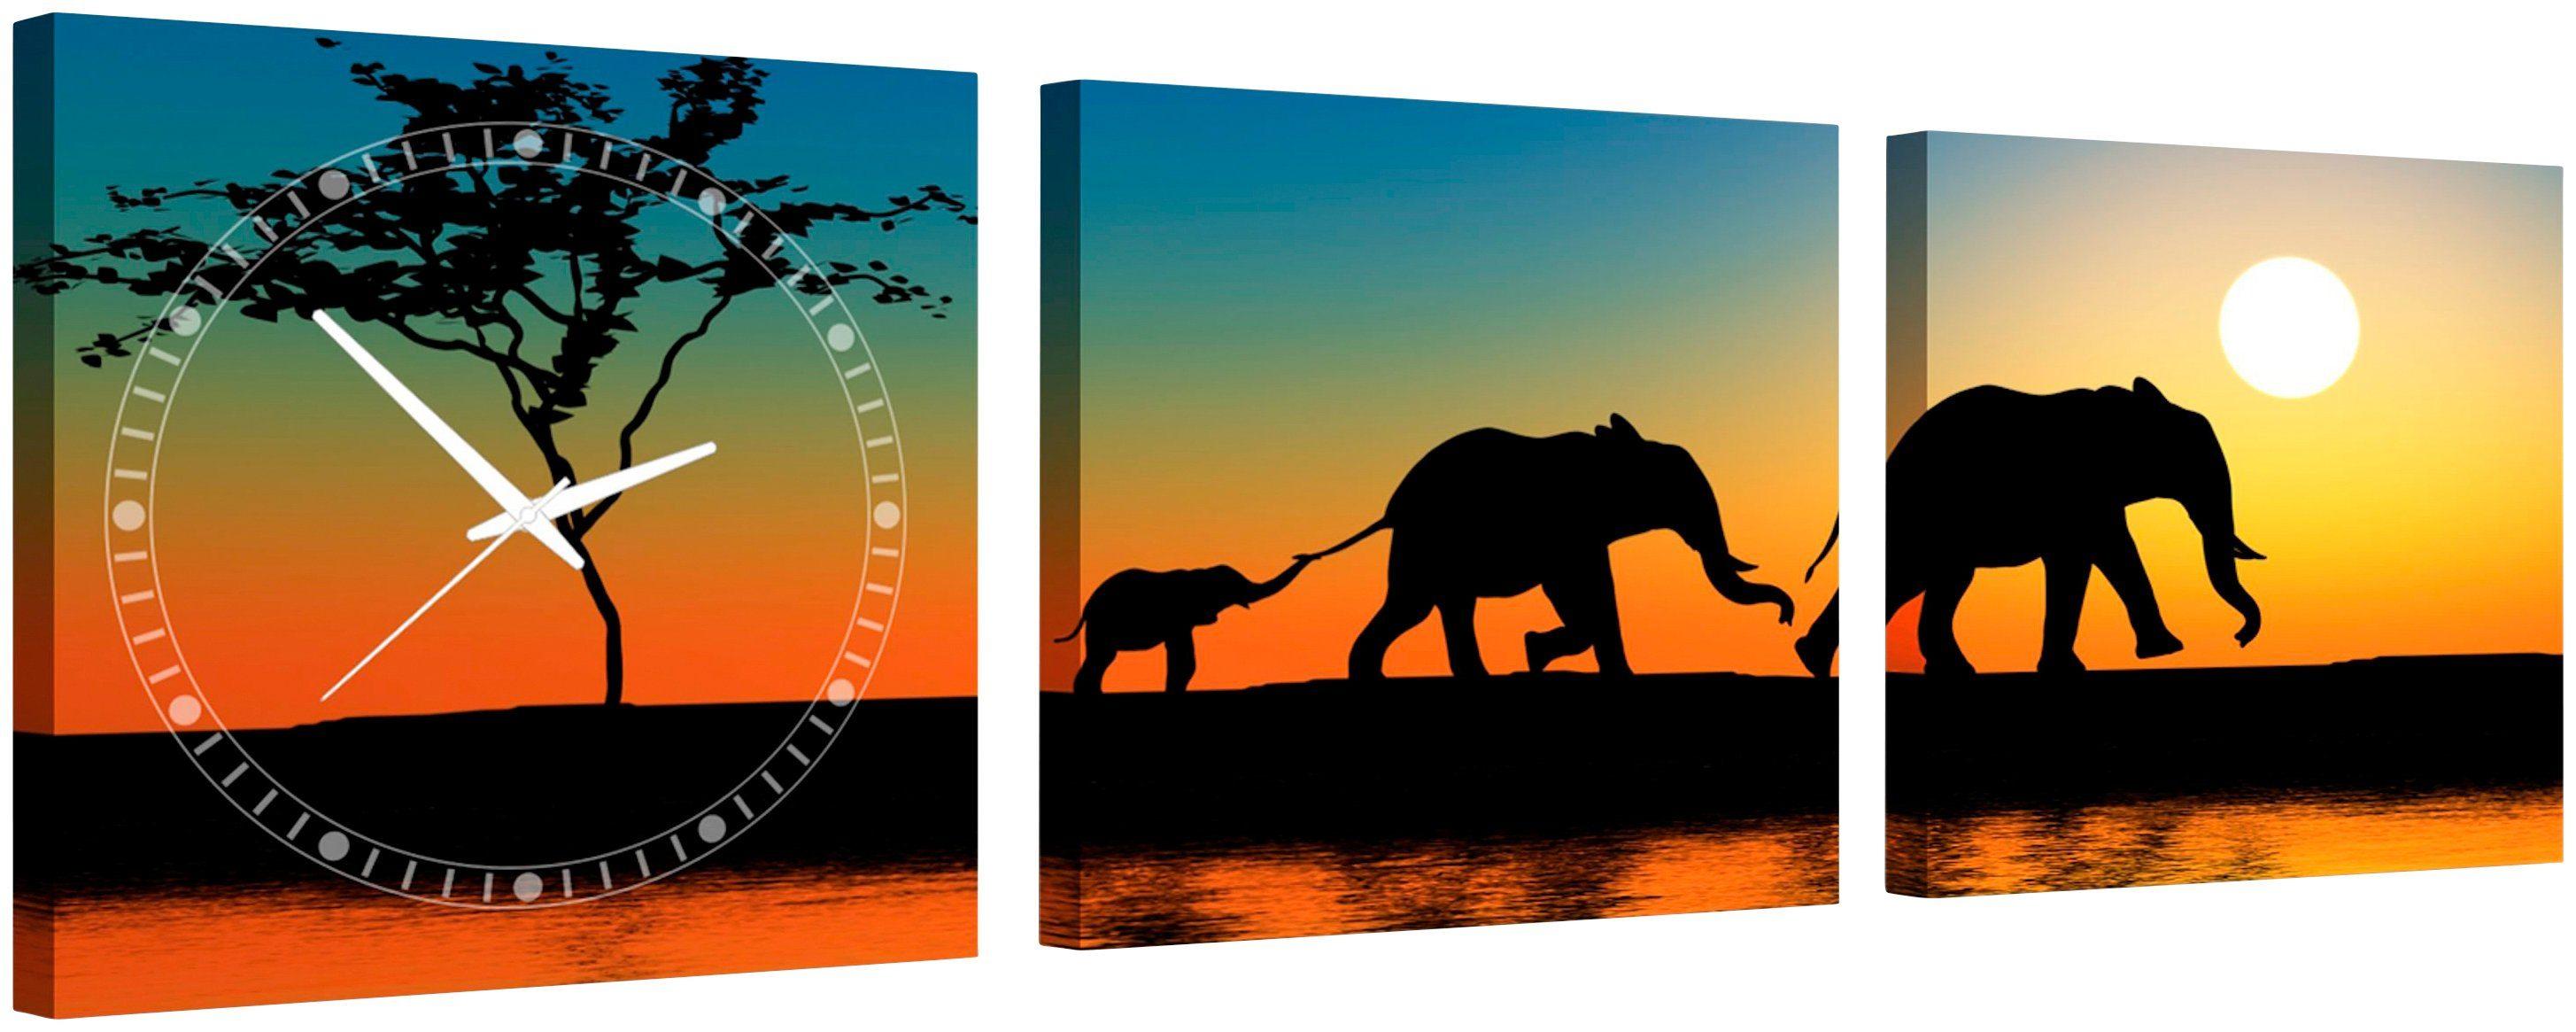 Komplett-Set: Leinwand »Walking Elephants«, mit dekorativer Uhr